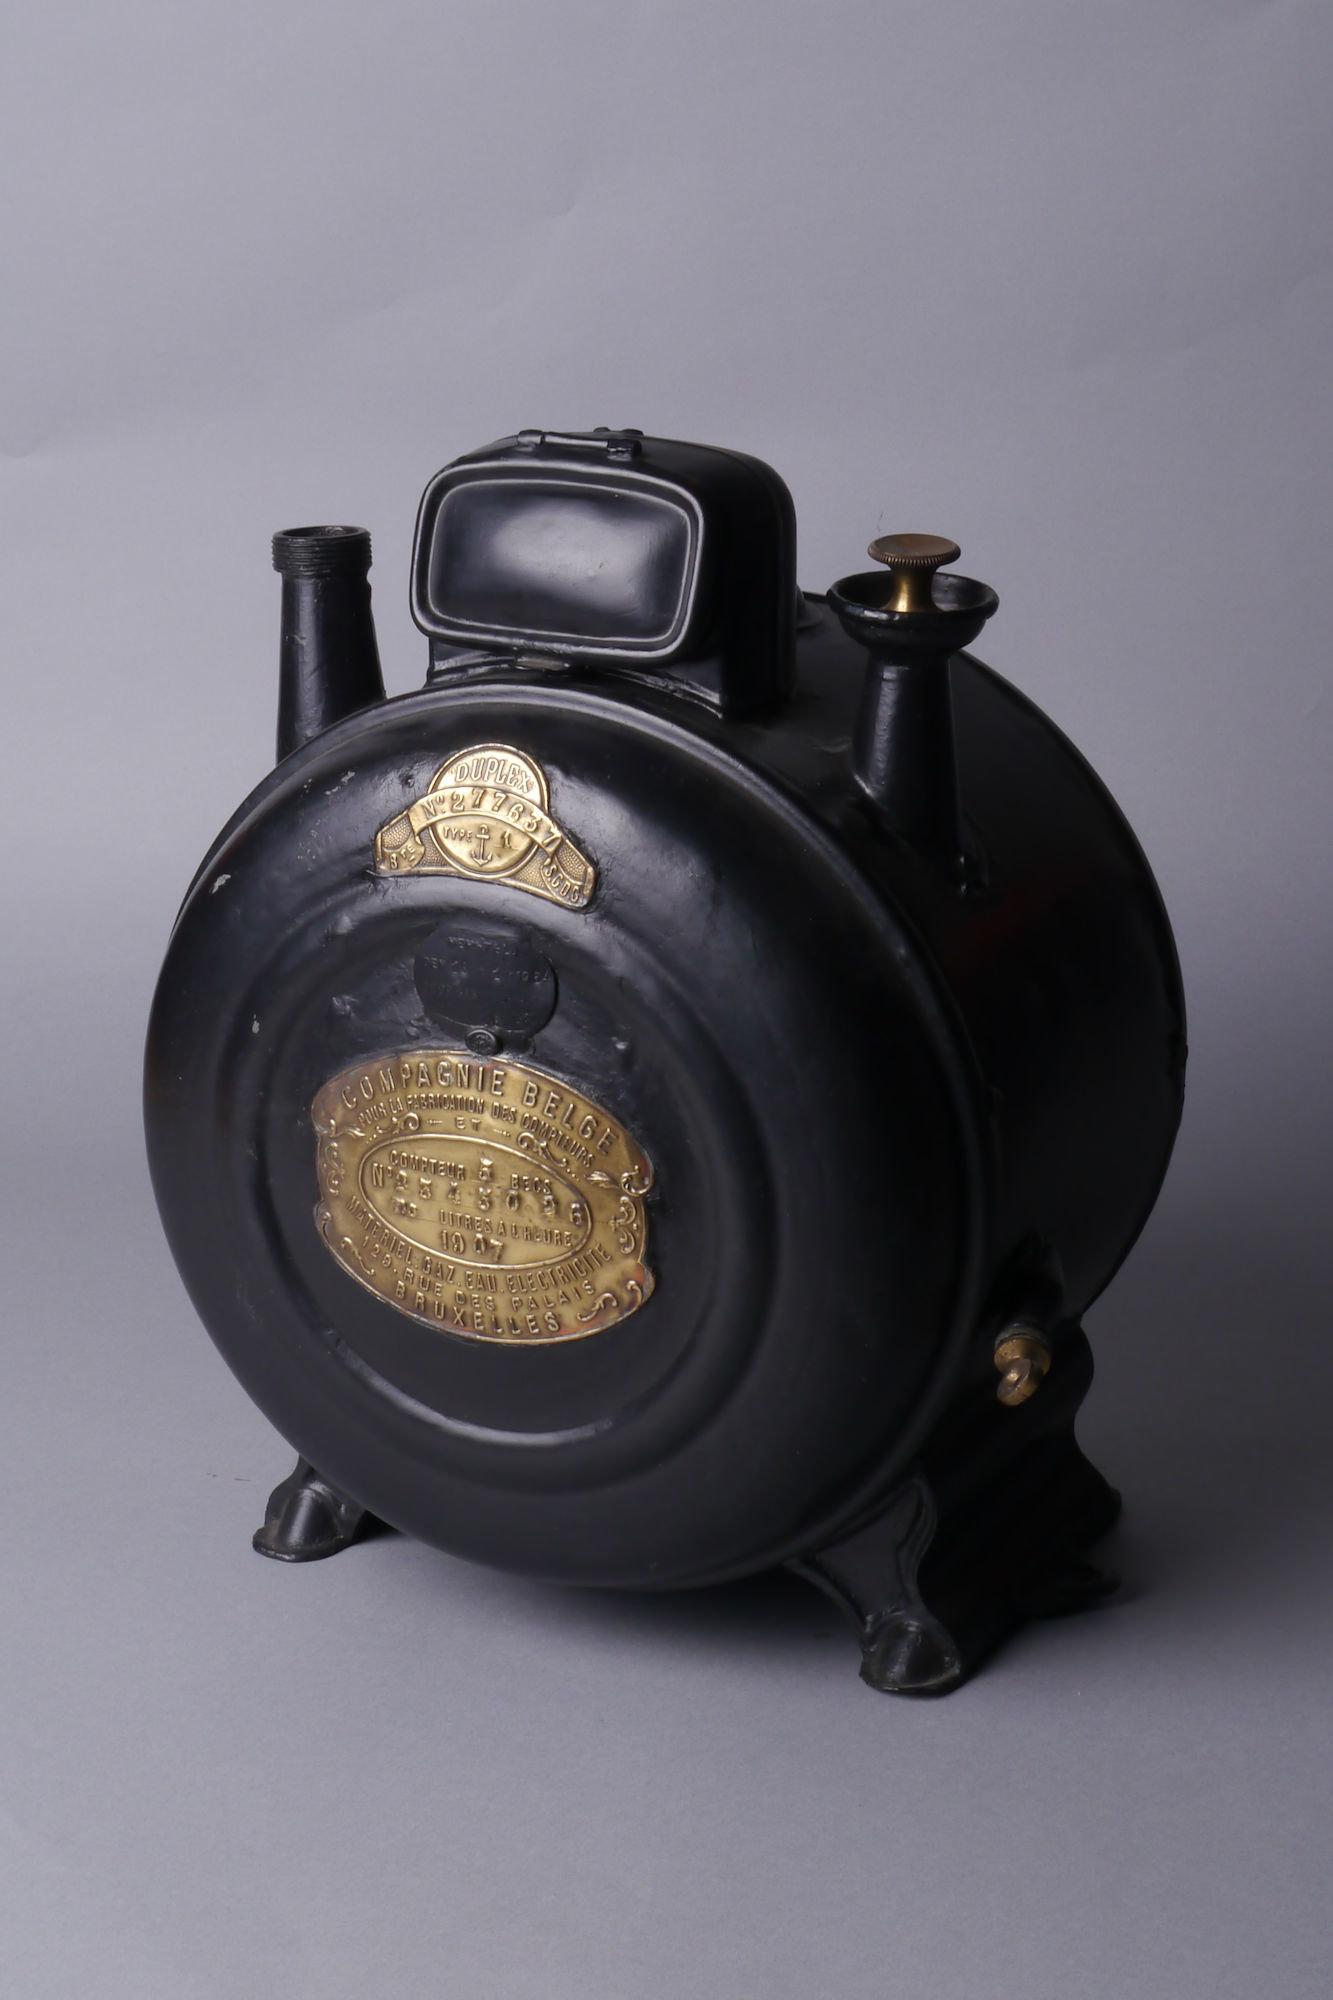 Verbruiksmeter voor gas van het merk Compagnie Belge pour la Fabrication des Compteurs